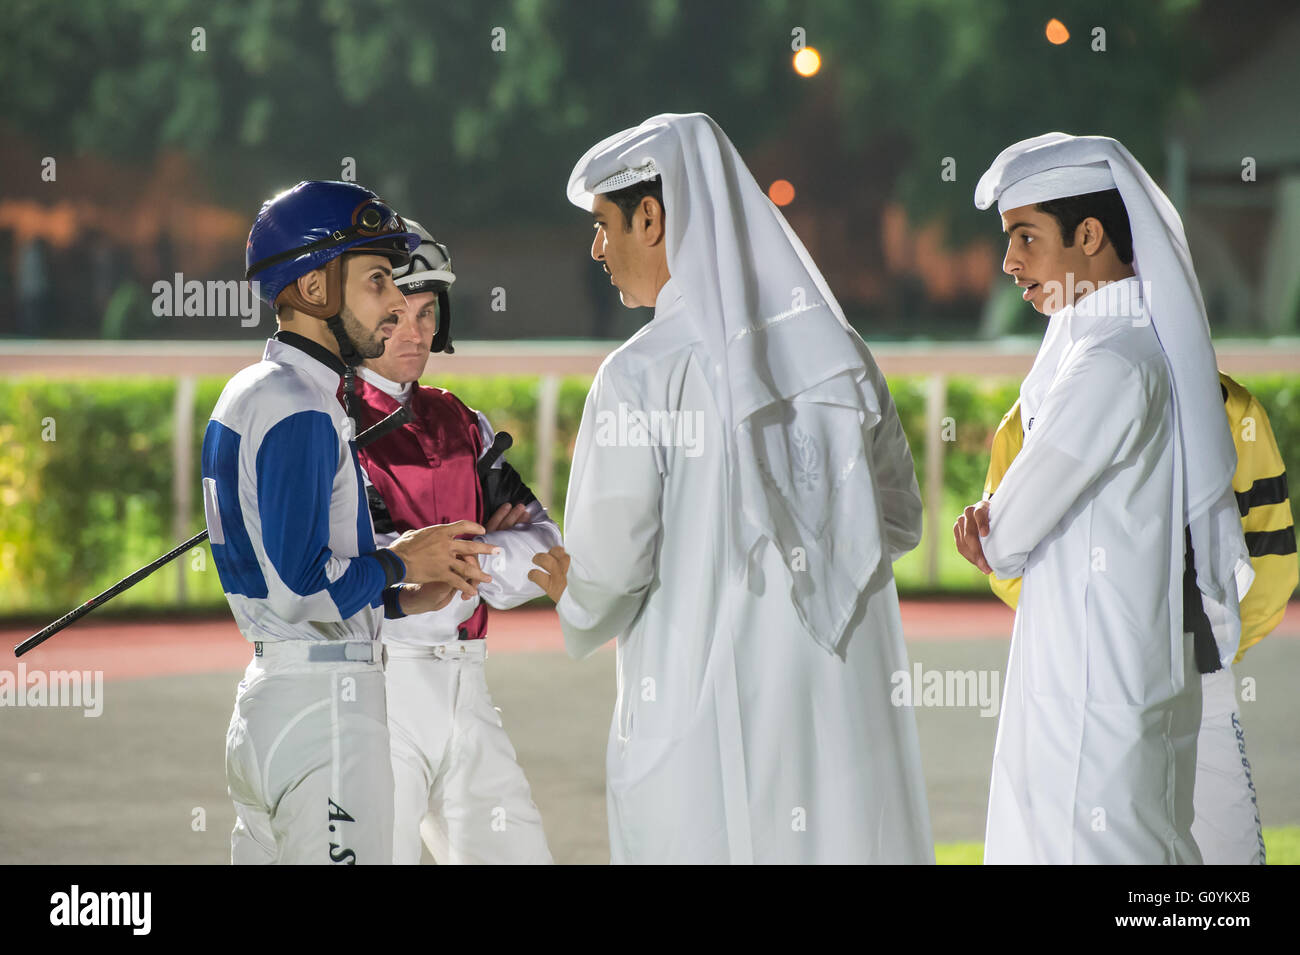 Qatar Racing & Equestrian Club, Doha.  Qatar 5th May 2016.  Trainer Jassim Mohammed Ghazali speaking to jockey Alberto Stock Photo